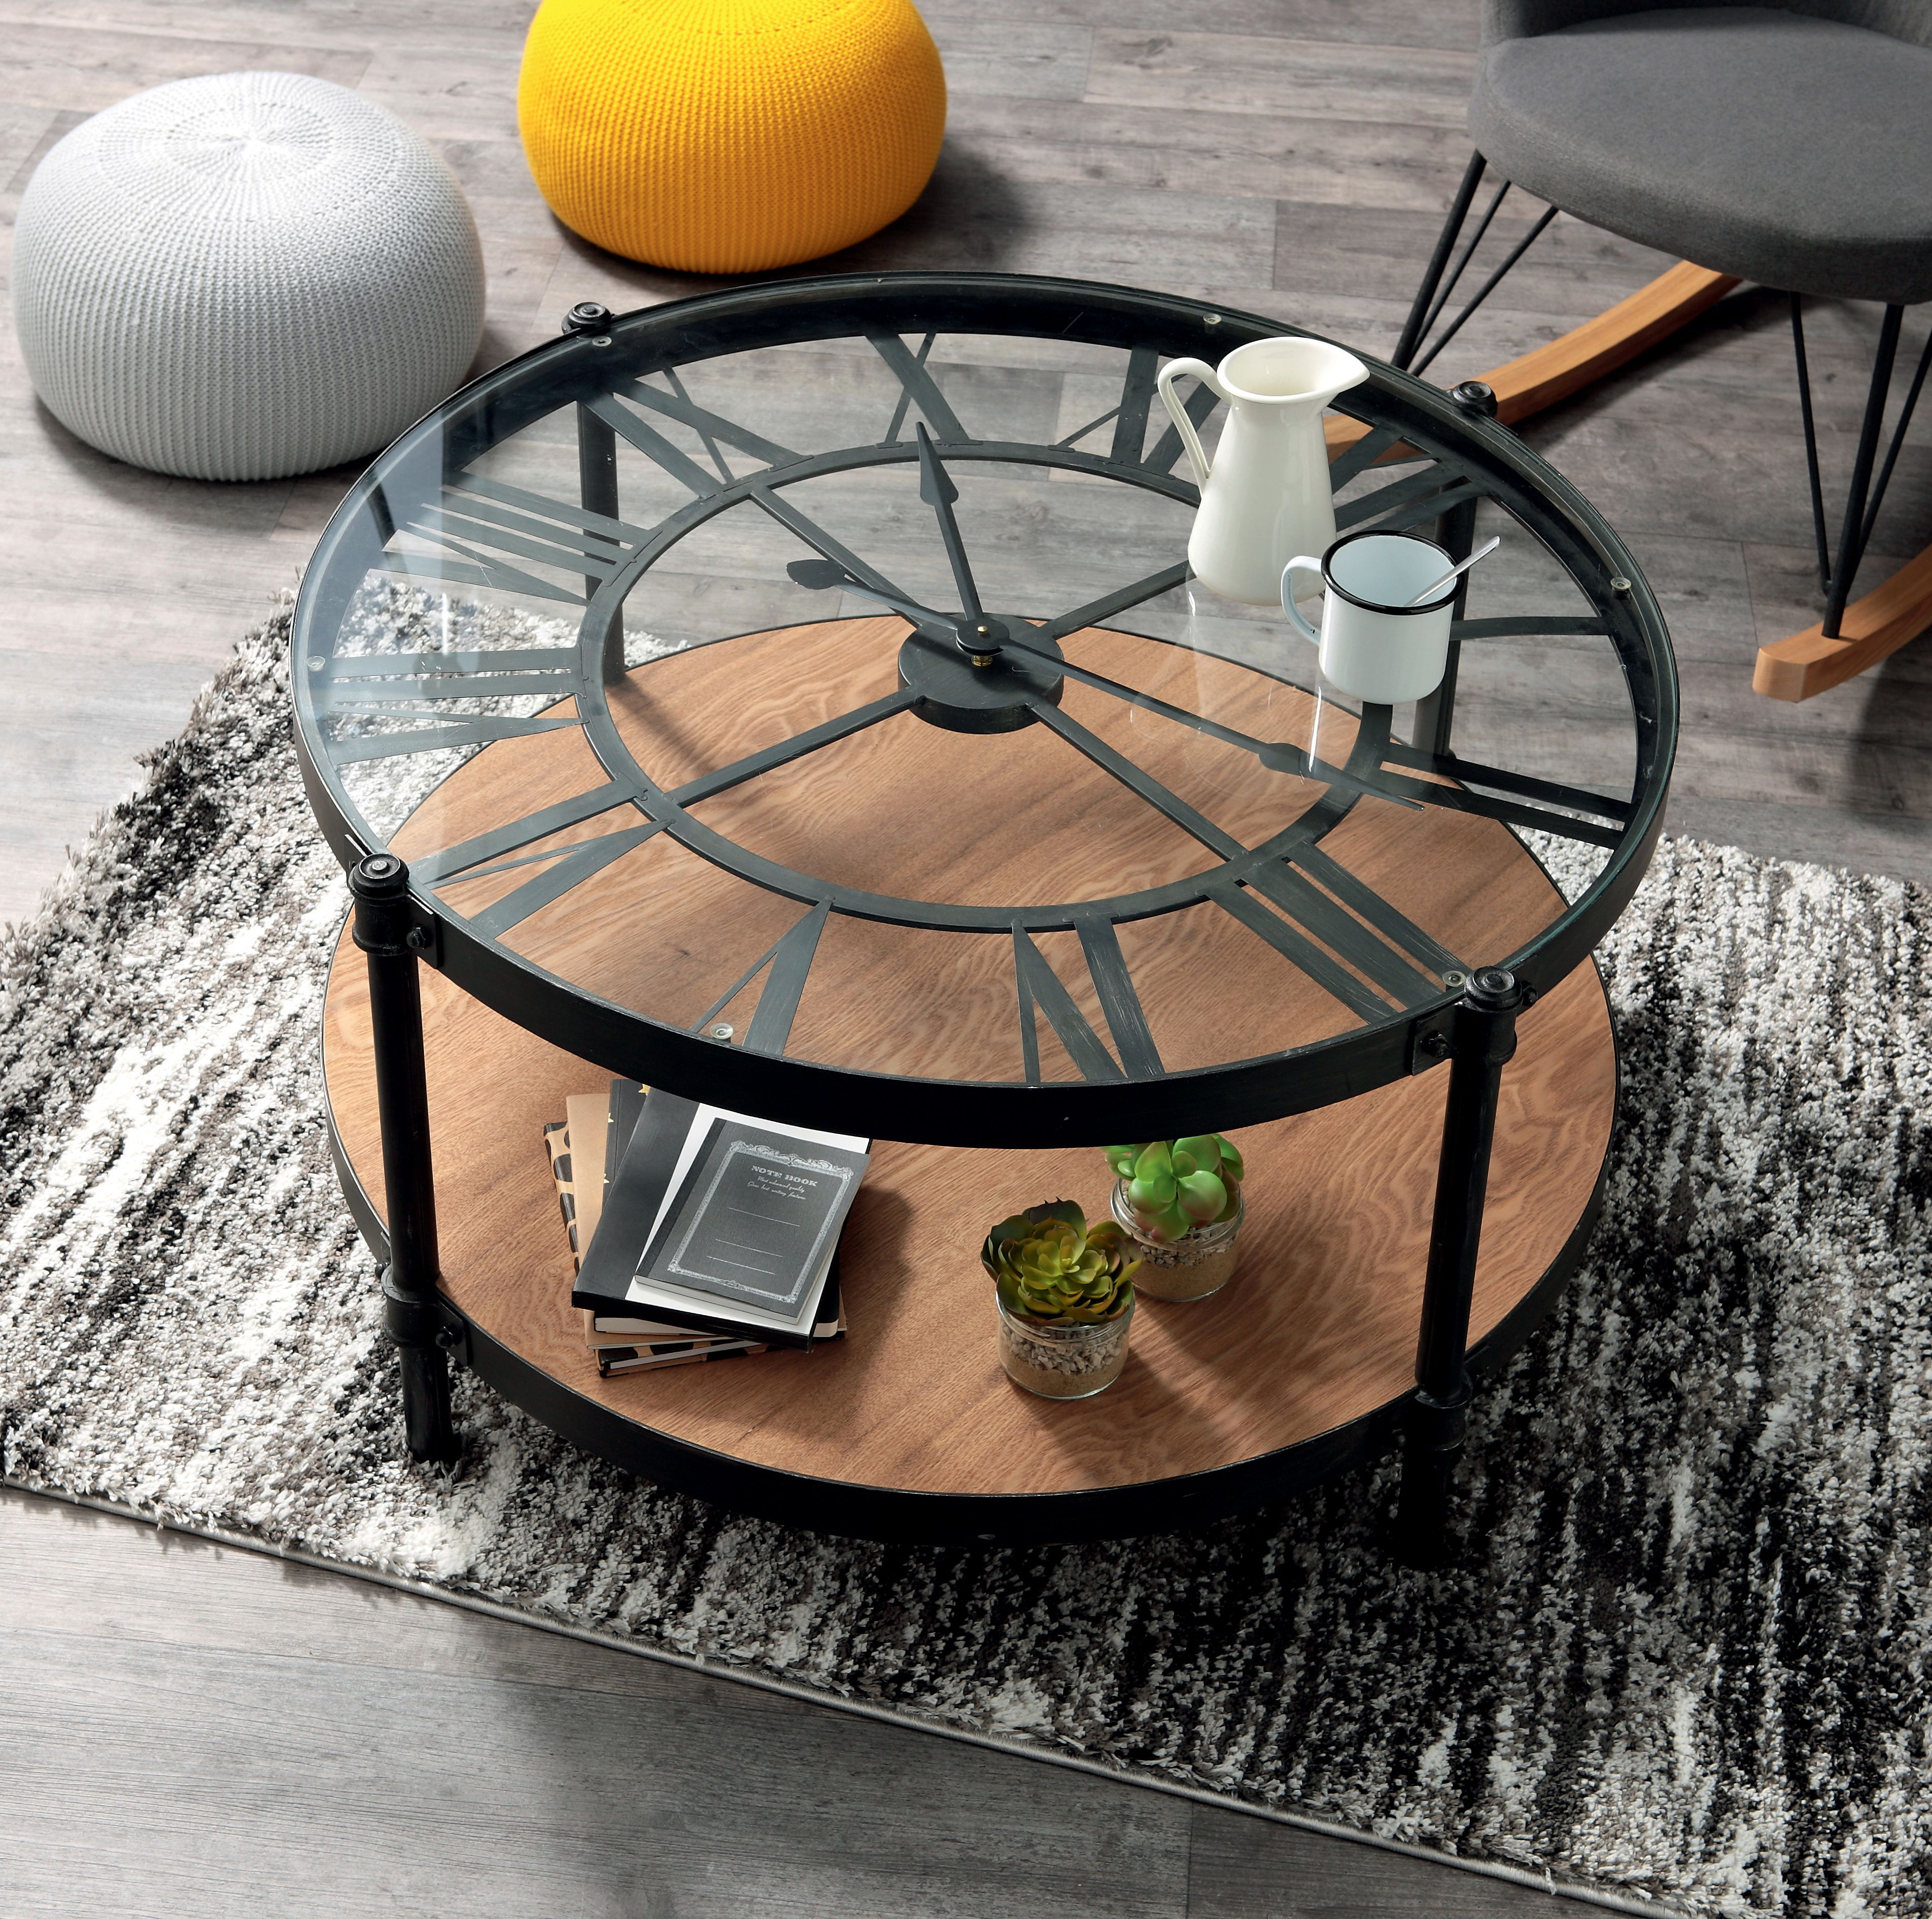 la table basse horloge table basse